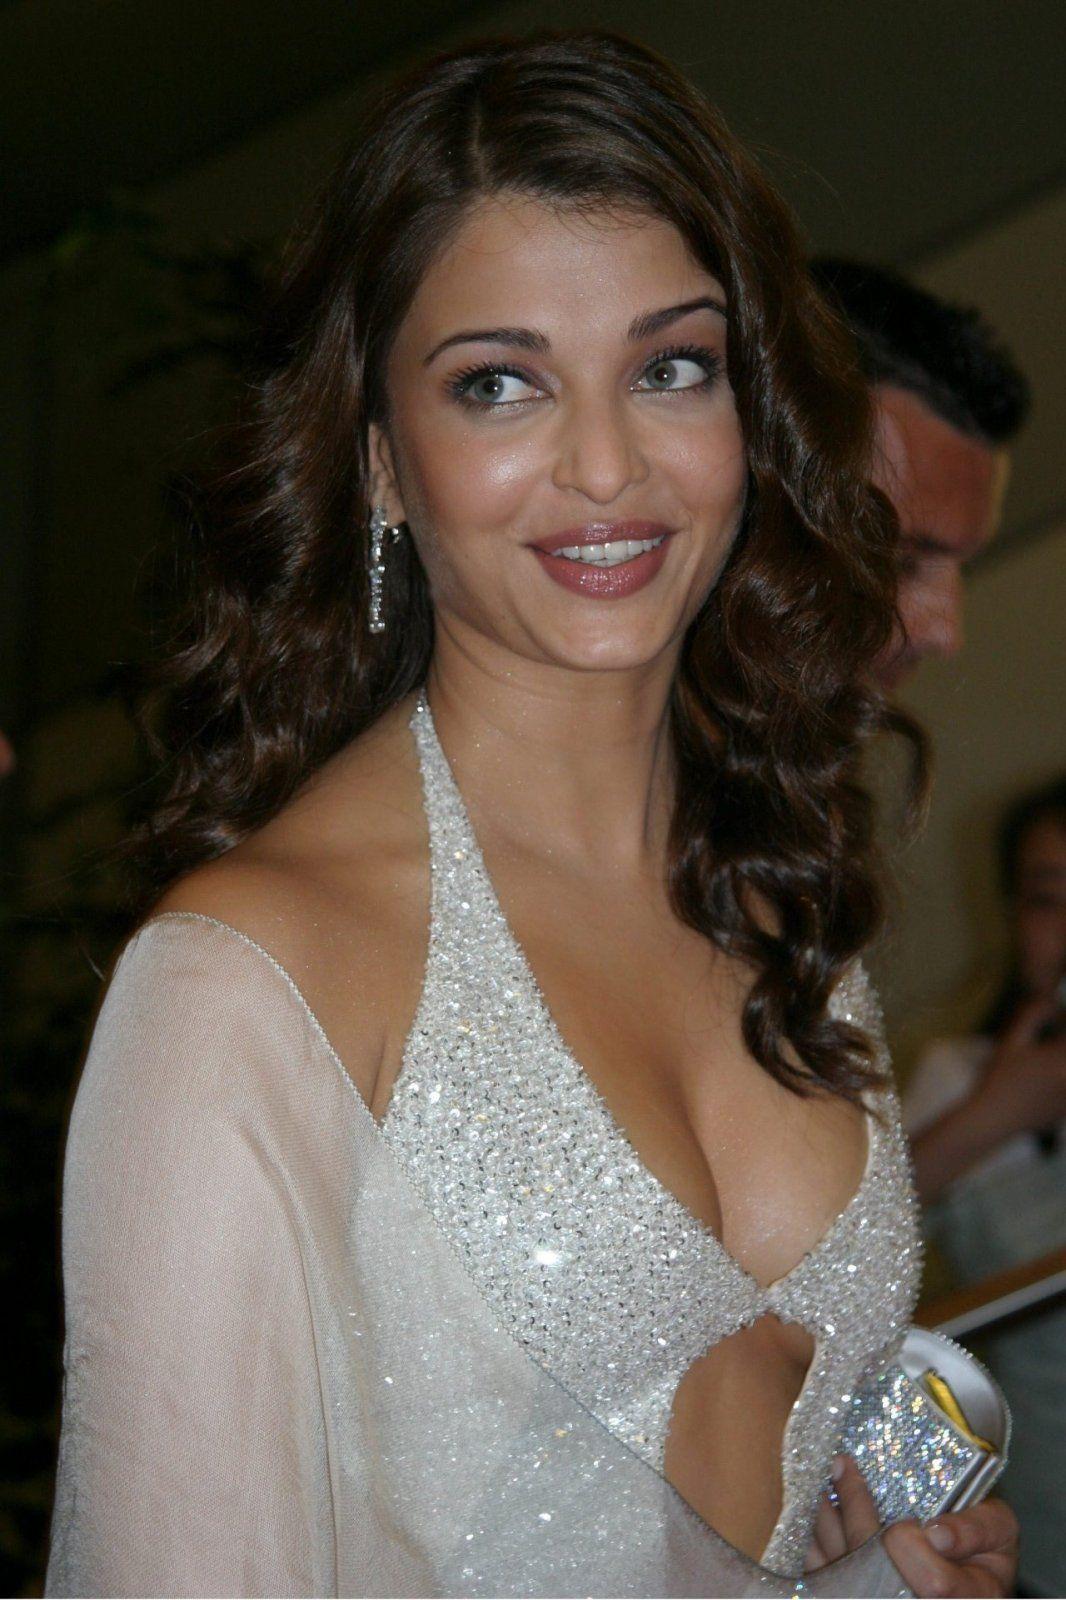 http://2.bp.blogspot.com/-zt5sG1uE8aE/UJQEkHMwh-I/AAAAAAAAAe0/udpJV-UHAHg/s1600/Aishwarya+Rai+Hot+Pictures.jpg